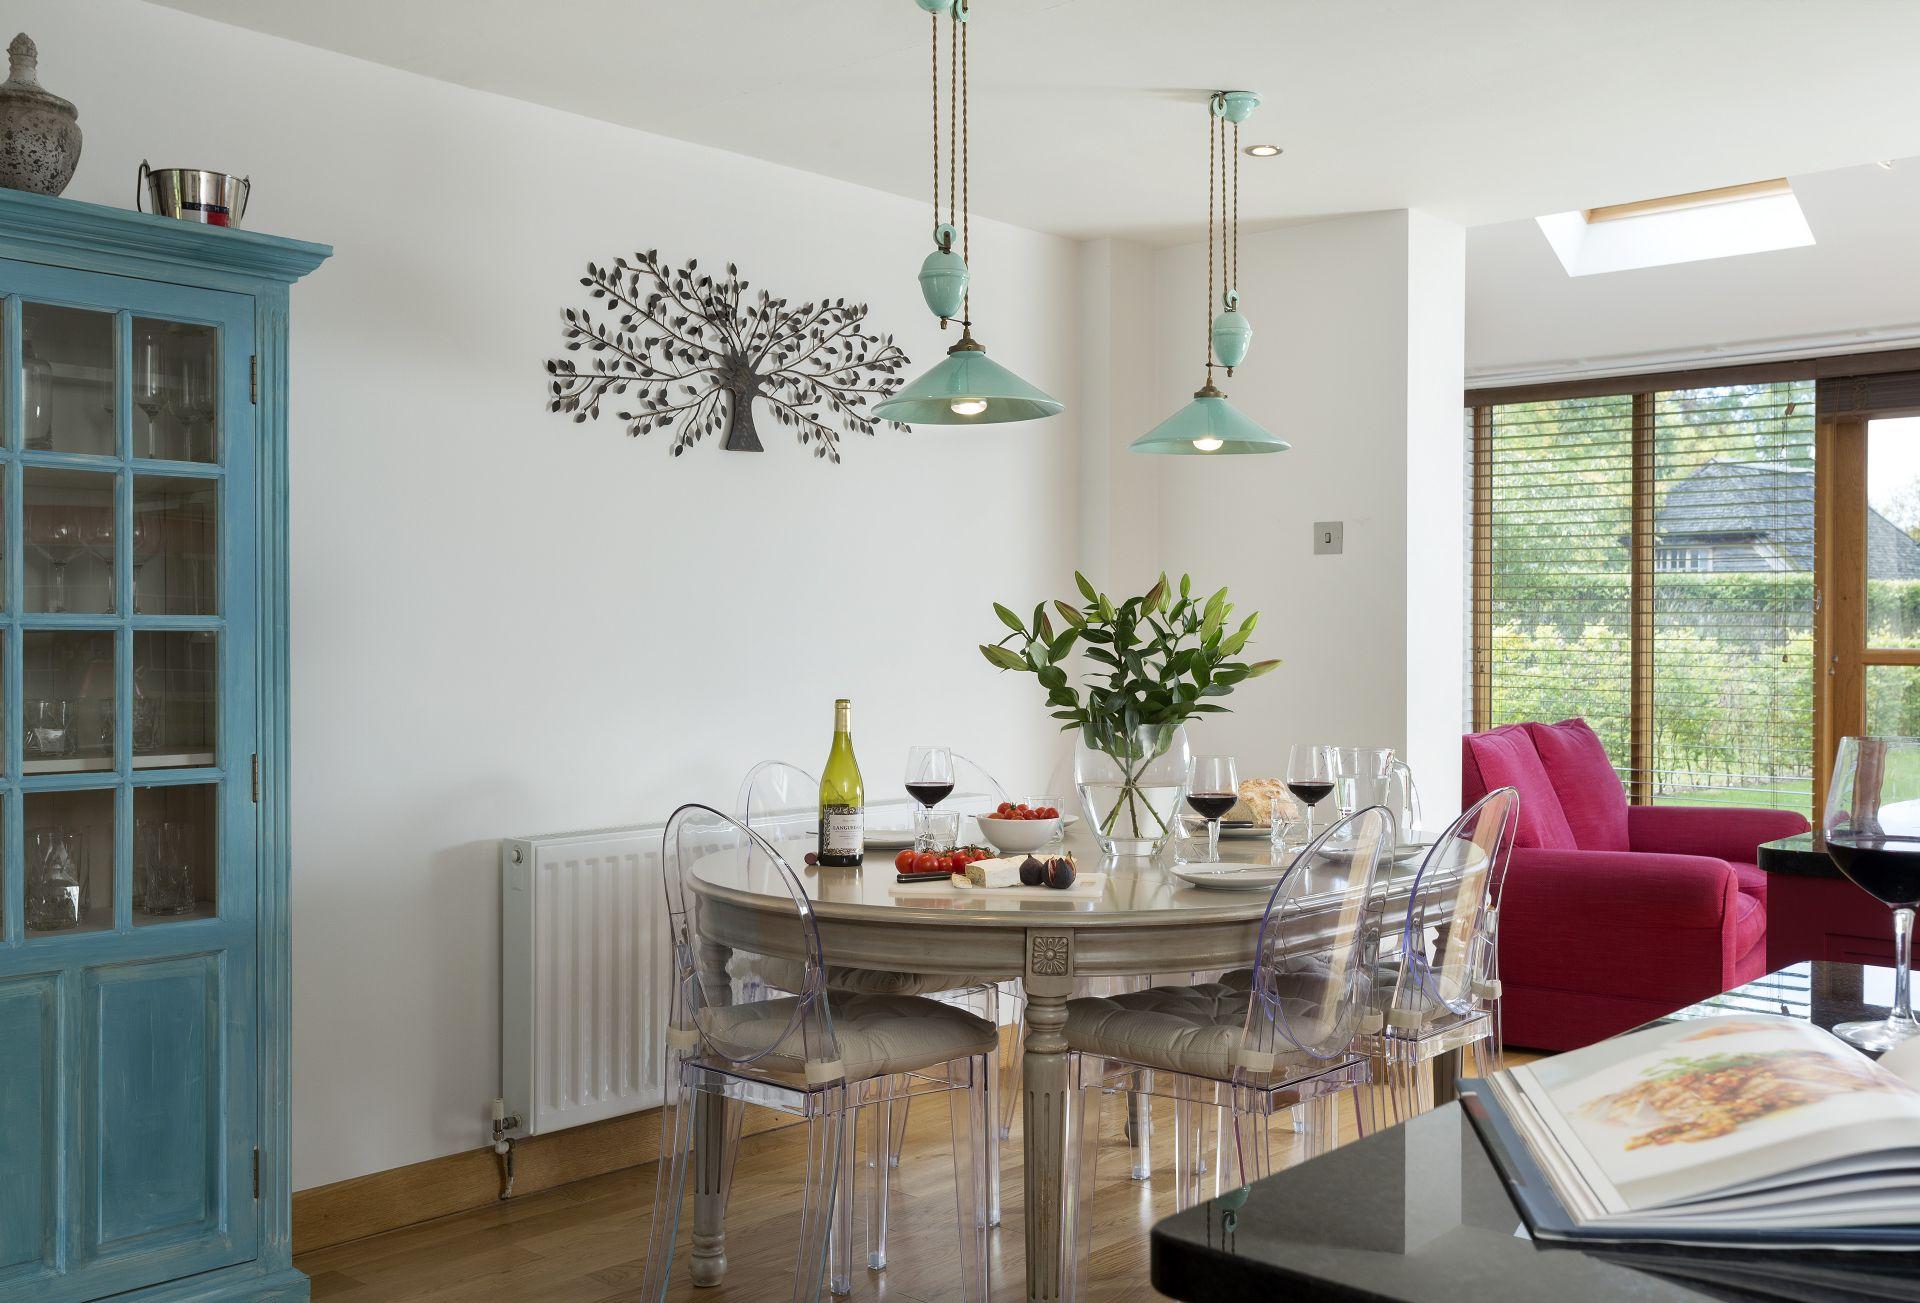 Ground floor:  Open-plan kitchen dining room